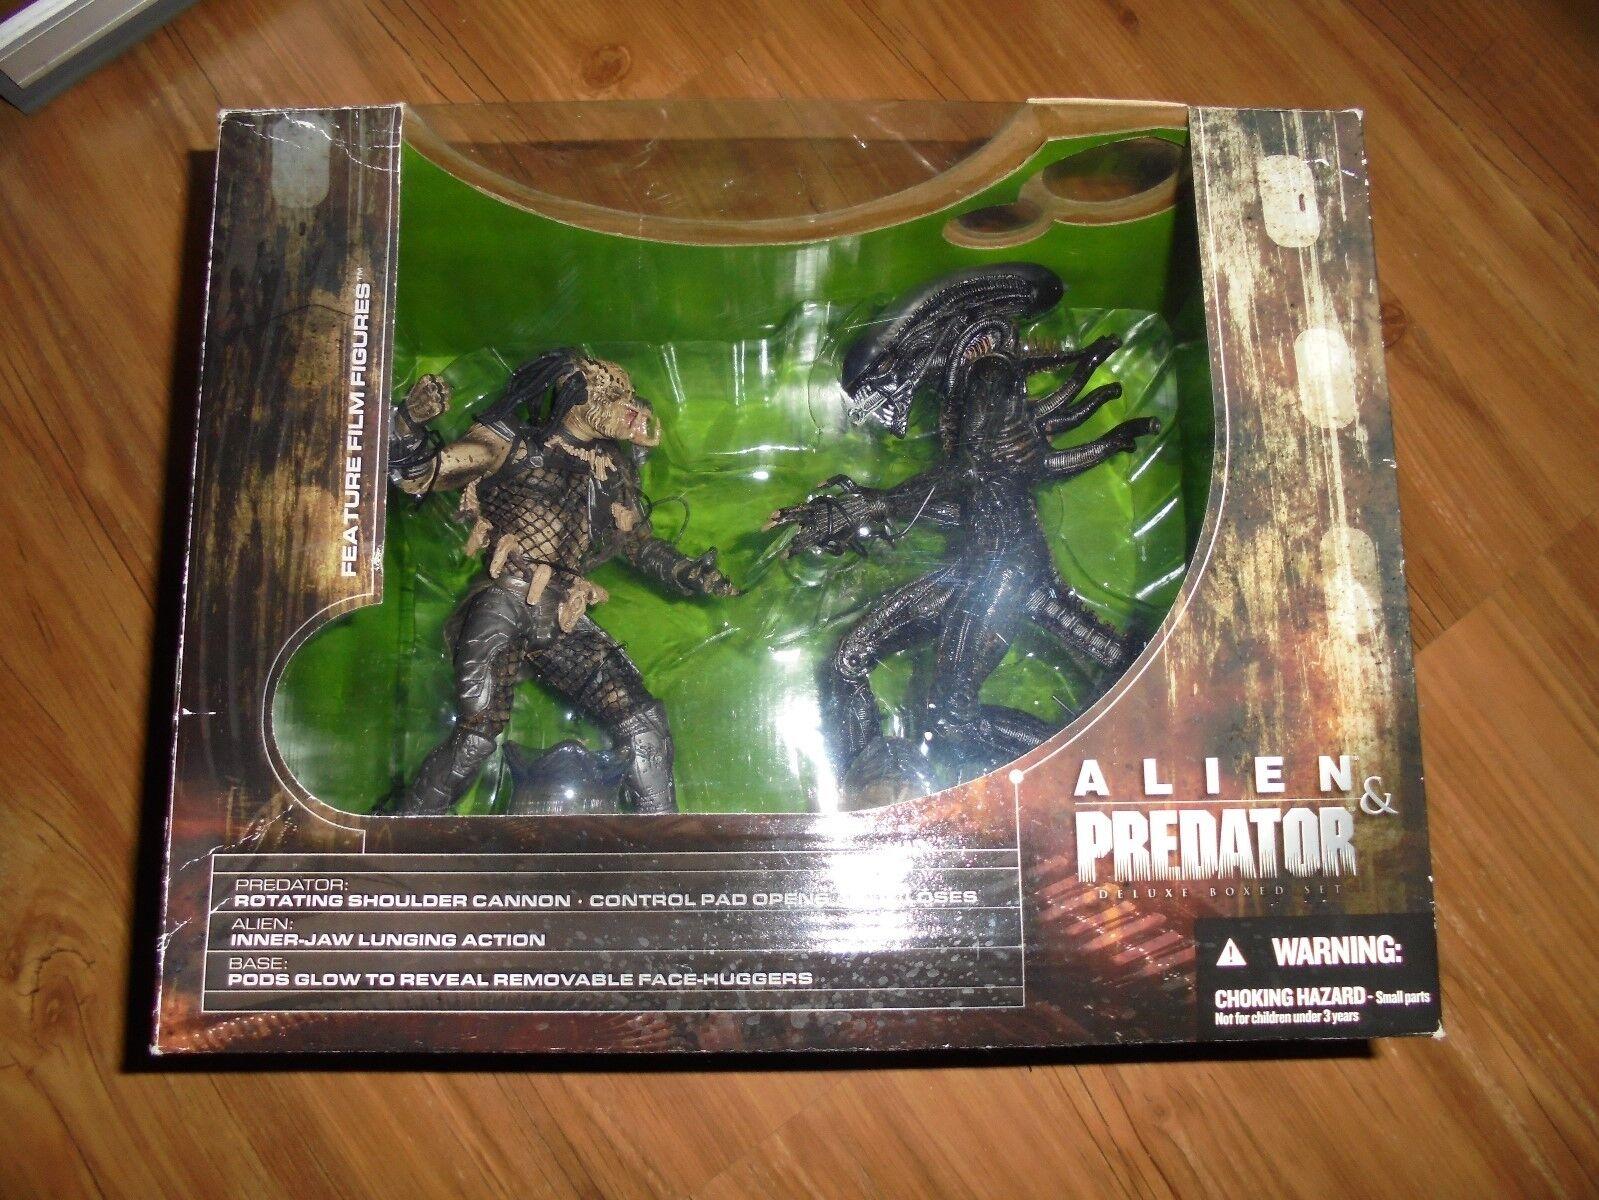 Alien - jäger film irren series5 deluxe boxedset zahlen mcfarlane 2002